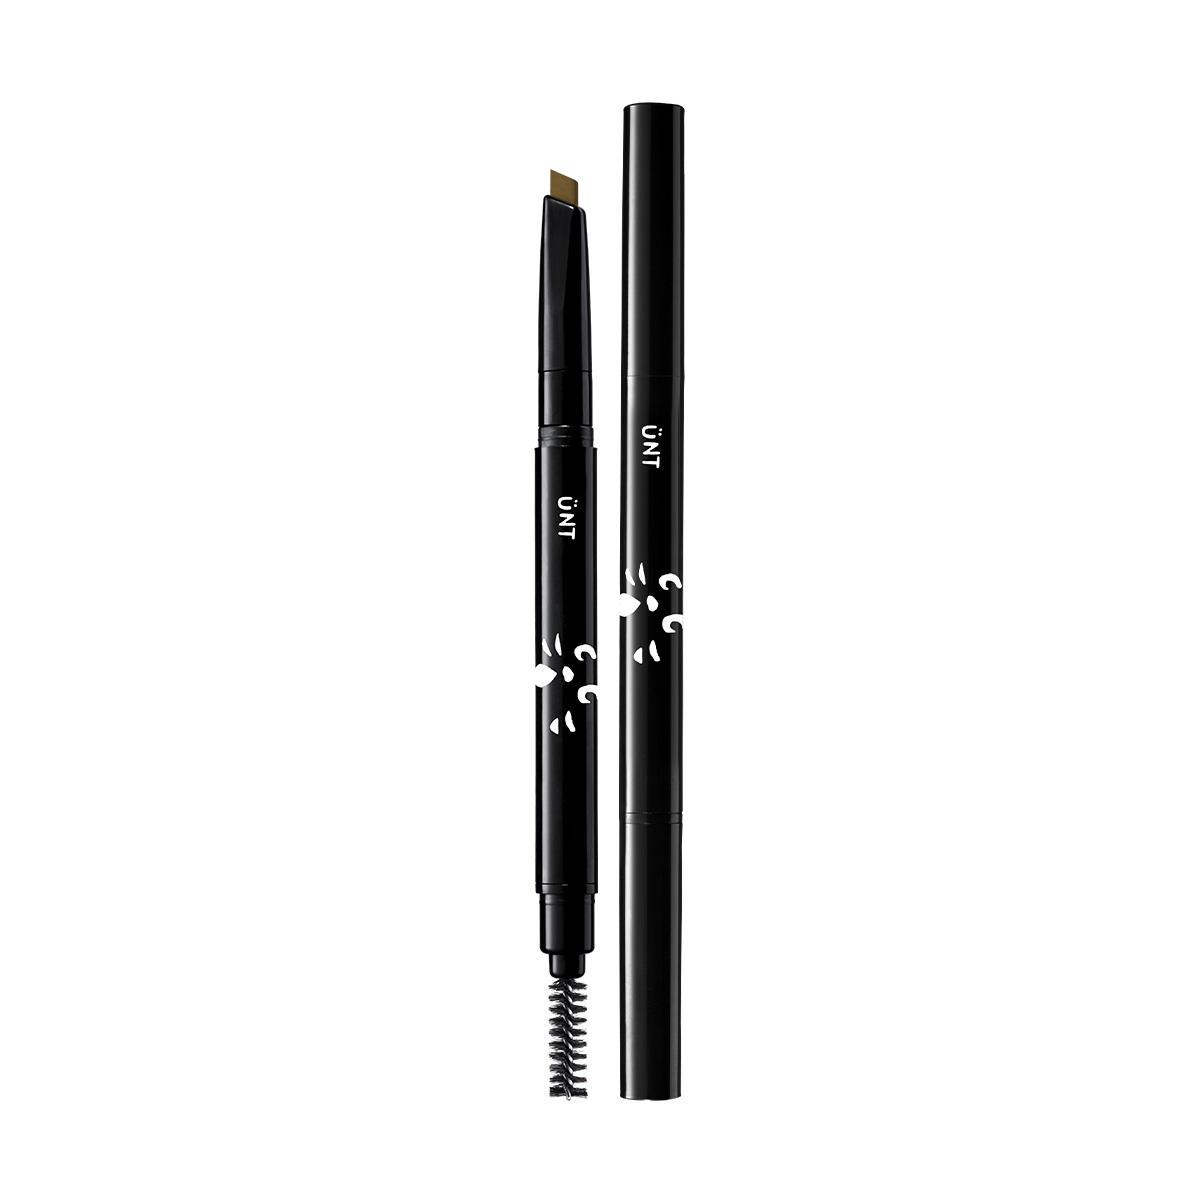 NYA-限量聯名 完美持色雙用眉筆